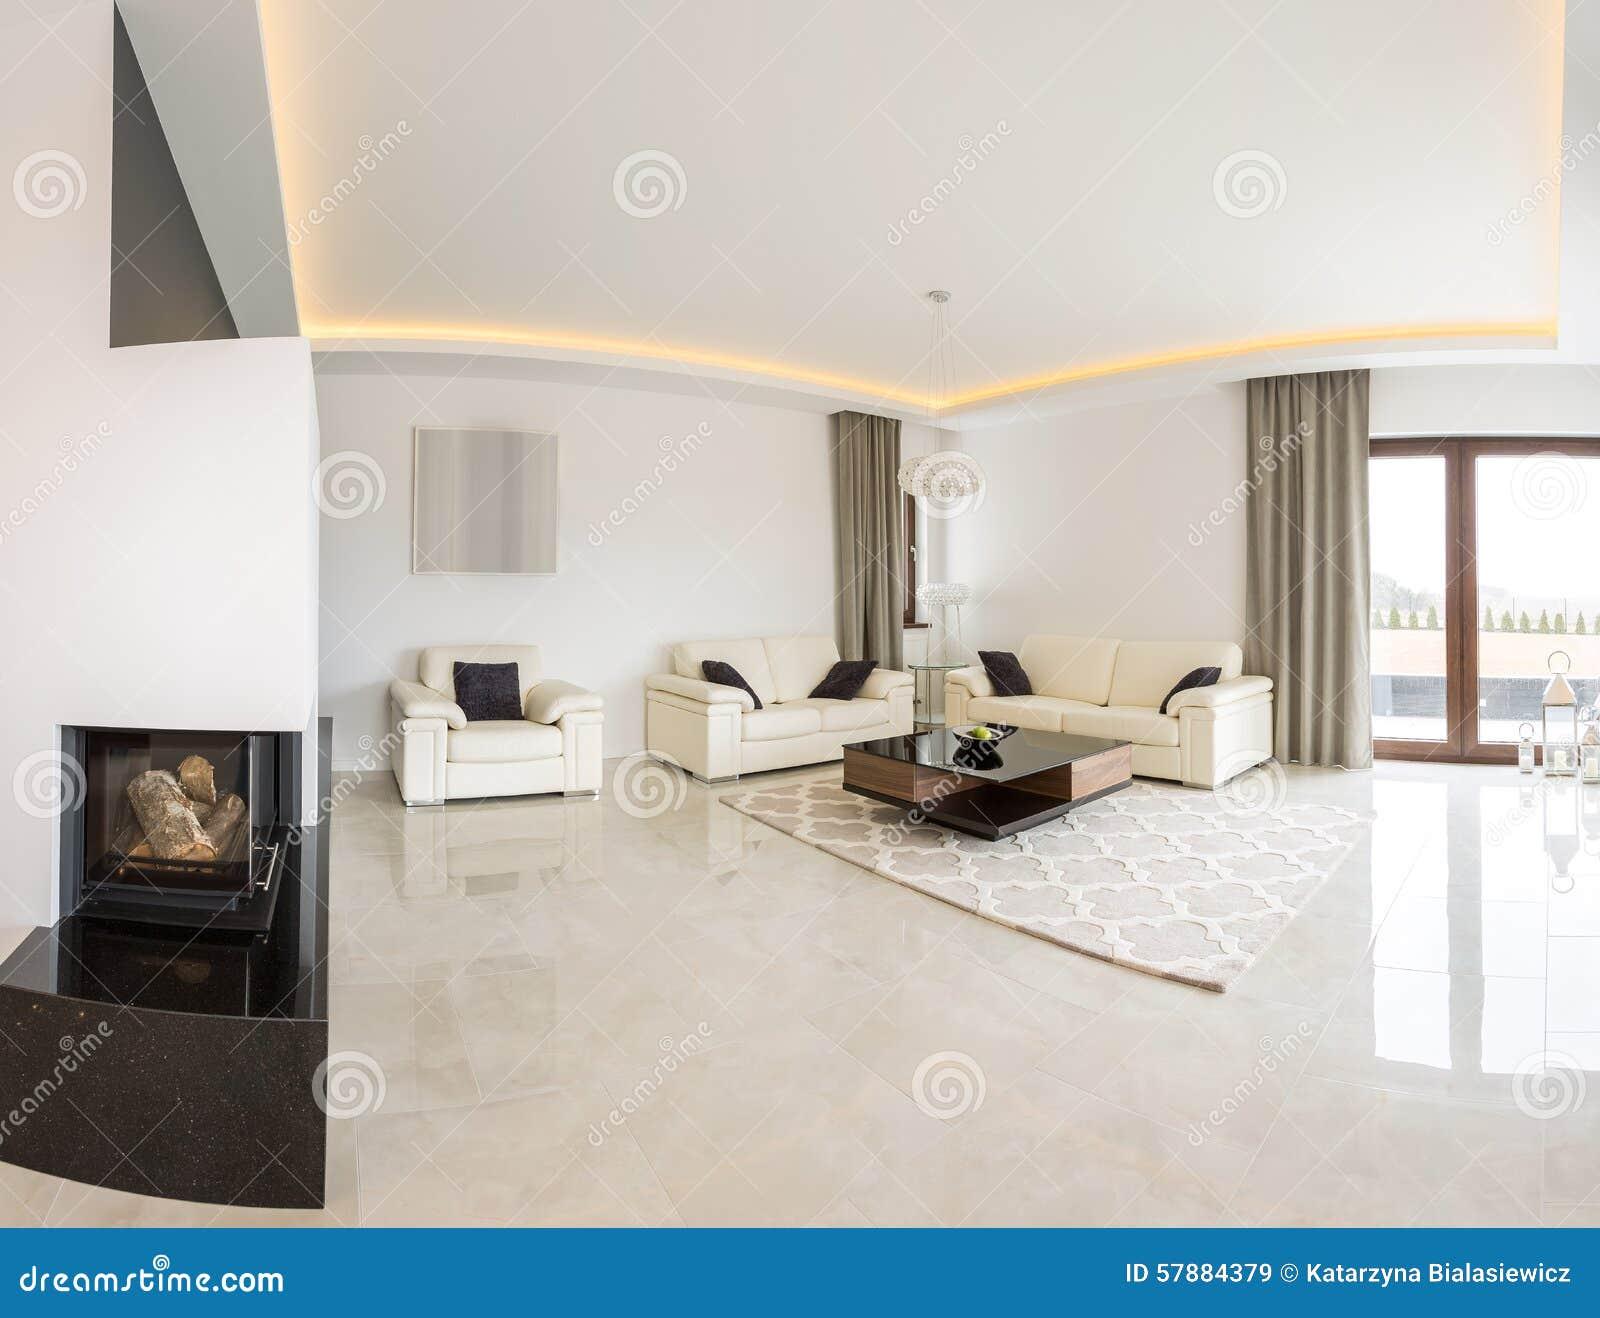 Verschiedene Heller Boden Beste Wahl Bright Living Room With Fireplace And Marble